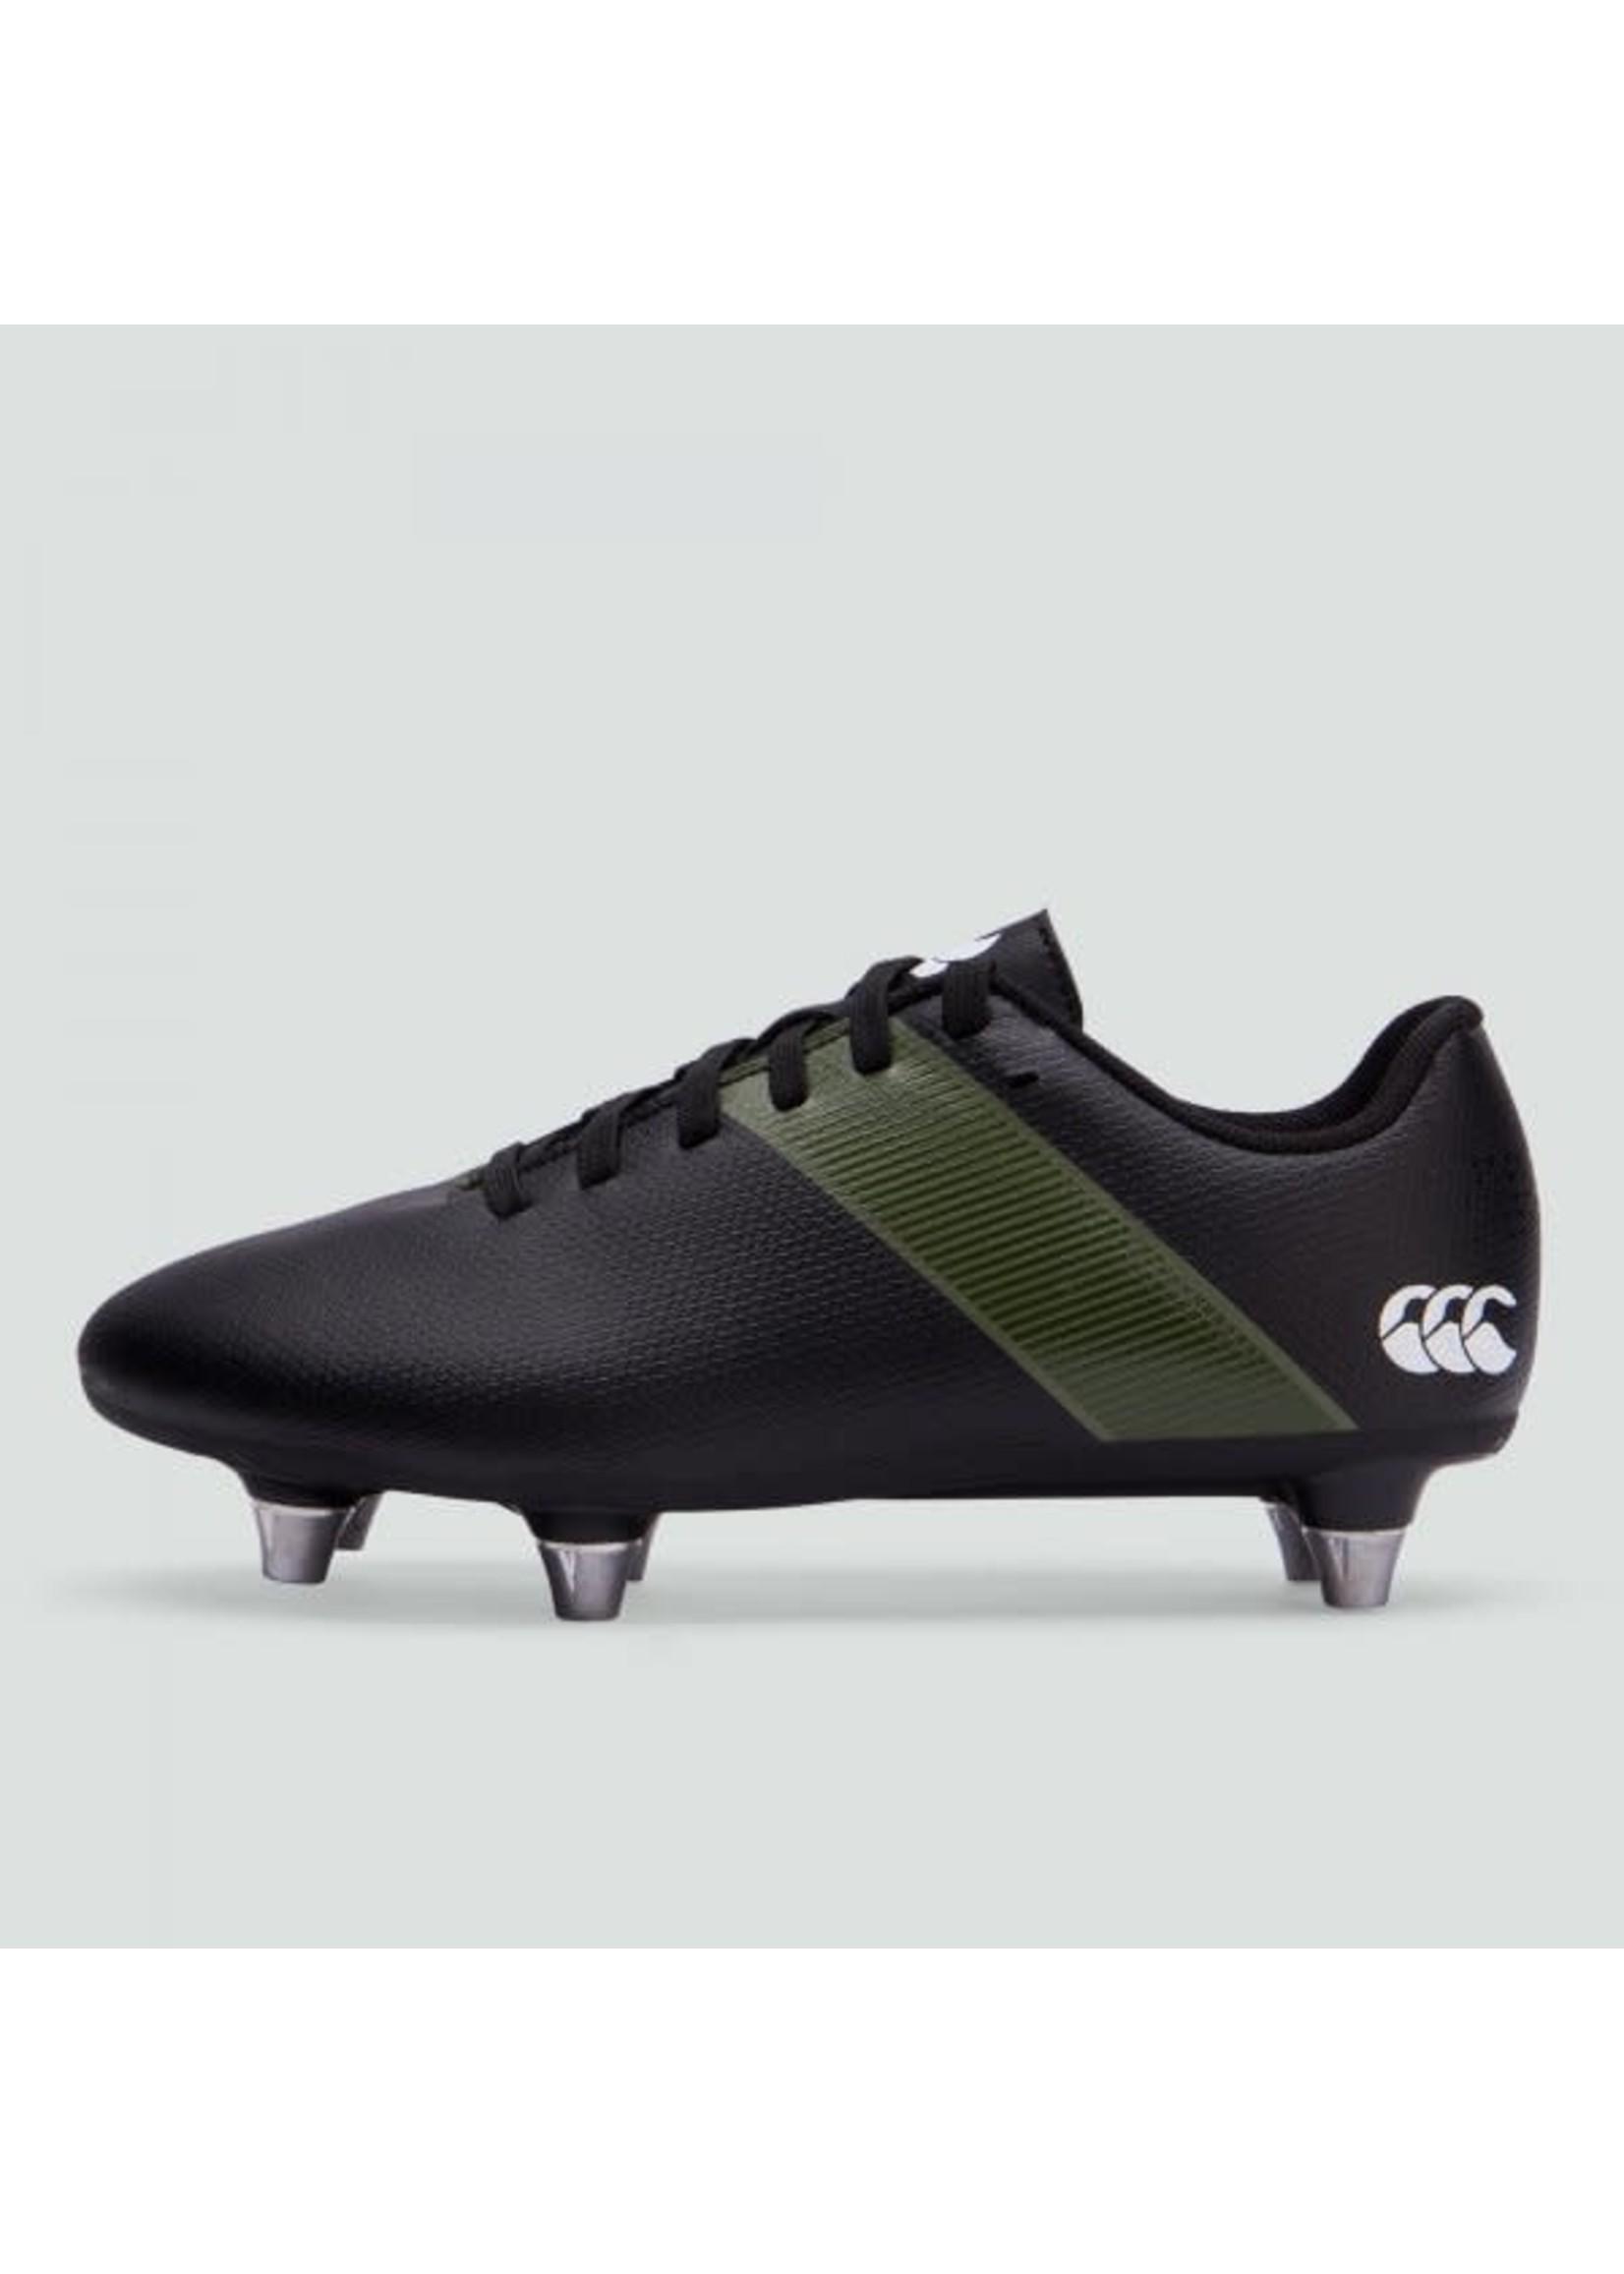 Canterbury Canterbury CCC Phoenix 3.0 SG Junior Rugby Boot (2021) Black/Green